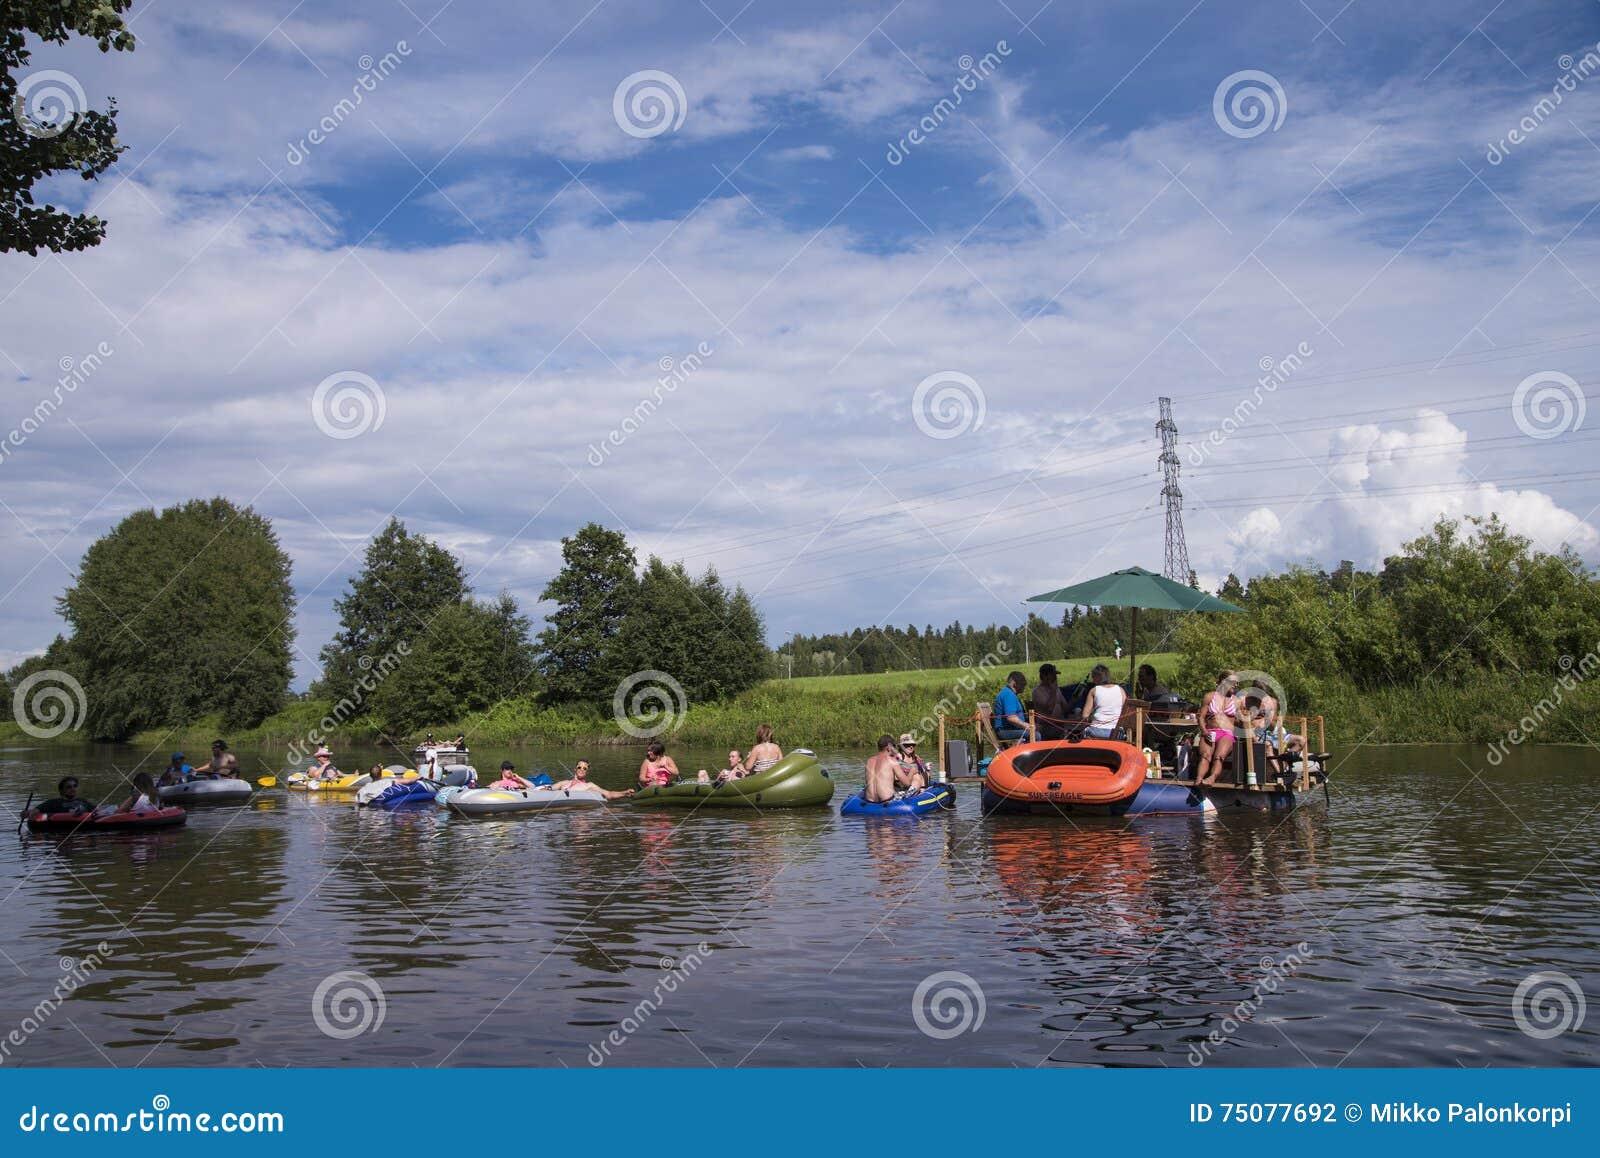 Niet geïdentificeerde mensen die onderaan de rivier in Kaljakellunta ( opstellen; Bier Floating) festival